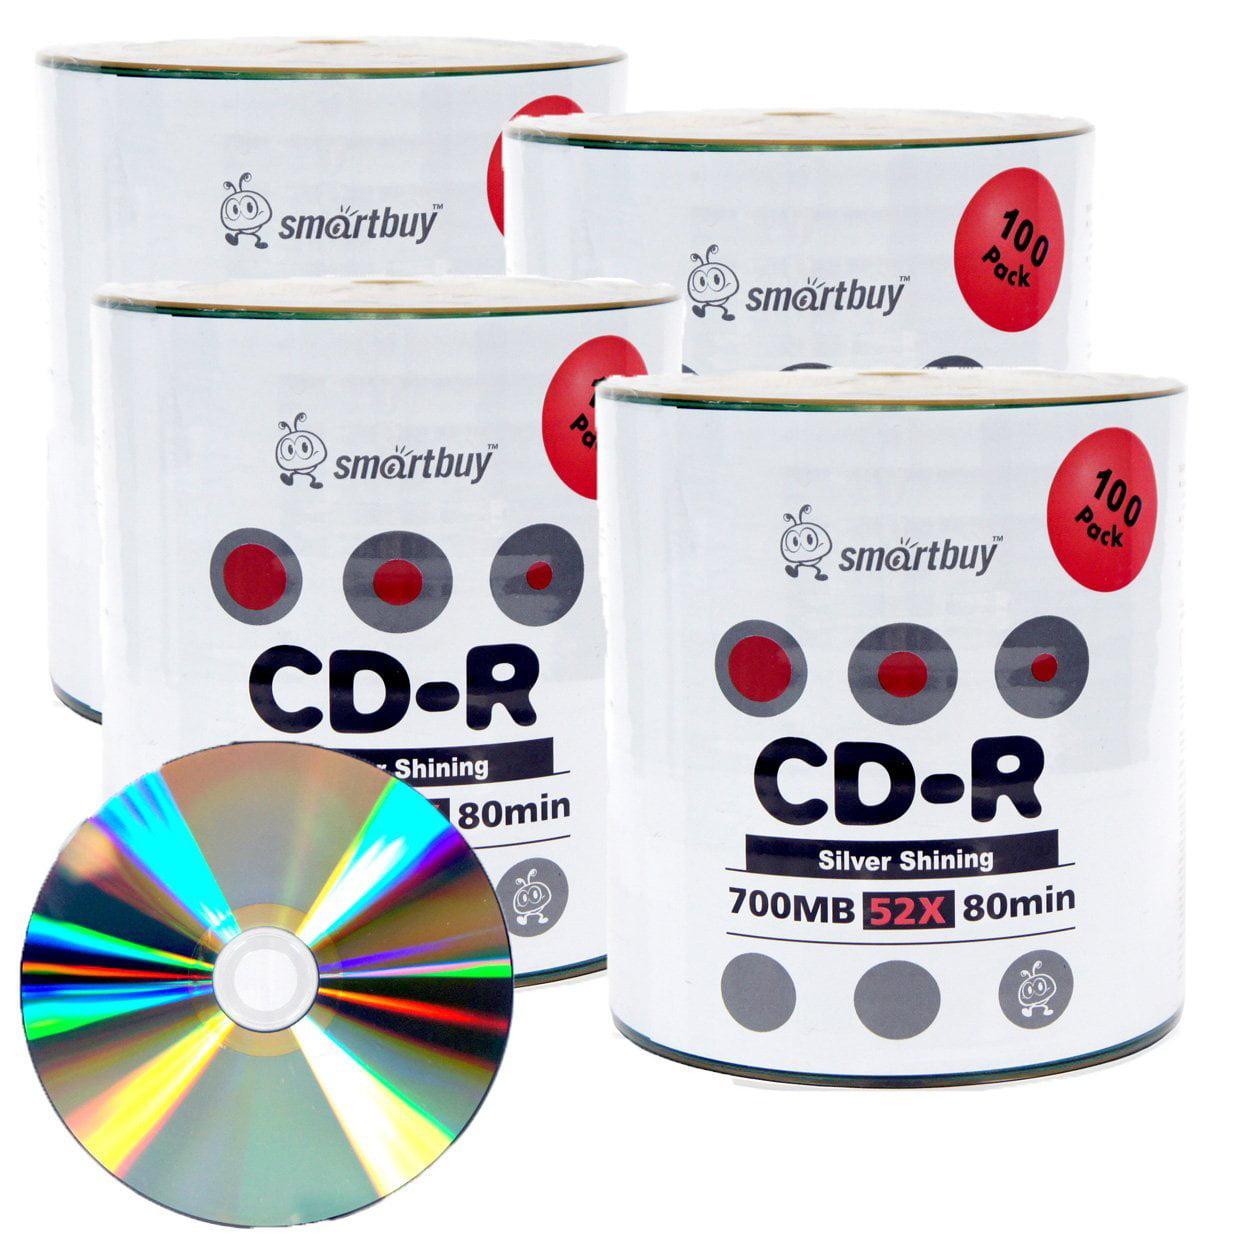 400 Pack Smartbuy 52X CD-R 700MB 80Min Shiny Silver (Non-Printable) Data Blank Media Recordable Disc